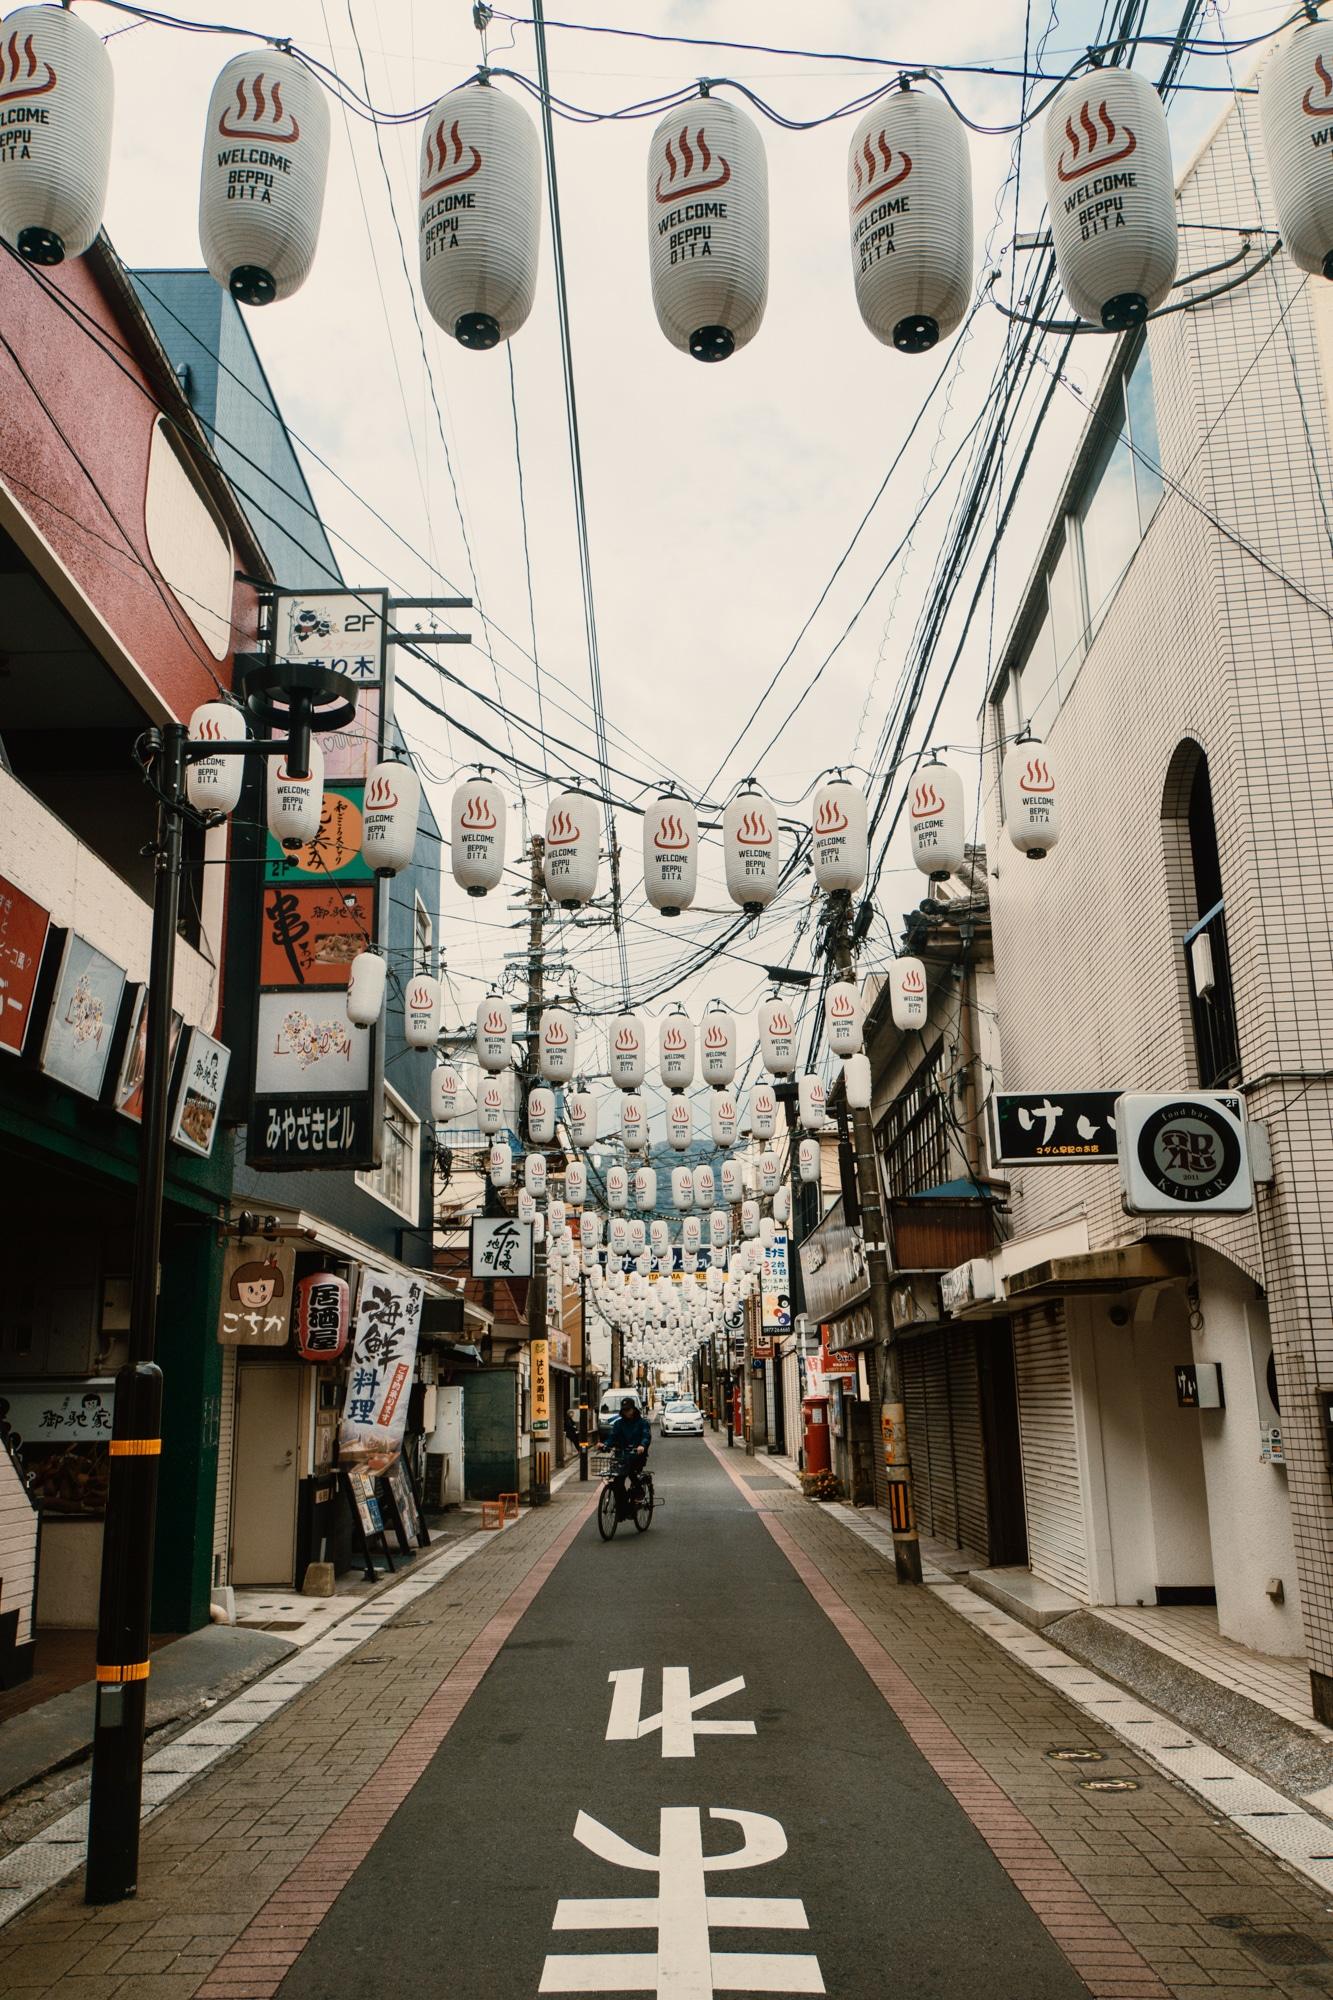 Kyushu Rundreise: Reisetipps, Onsen und Highlights in Japans Süden - Kurokawa Onsen Hopping - Beppu